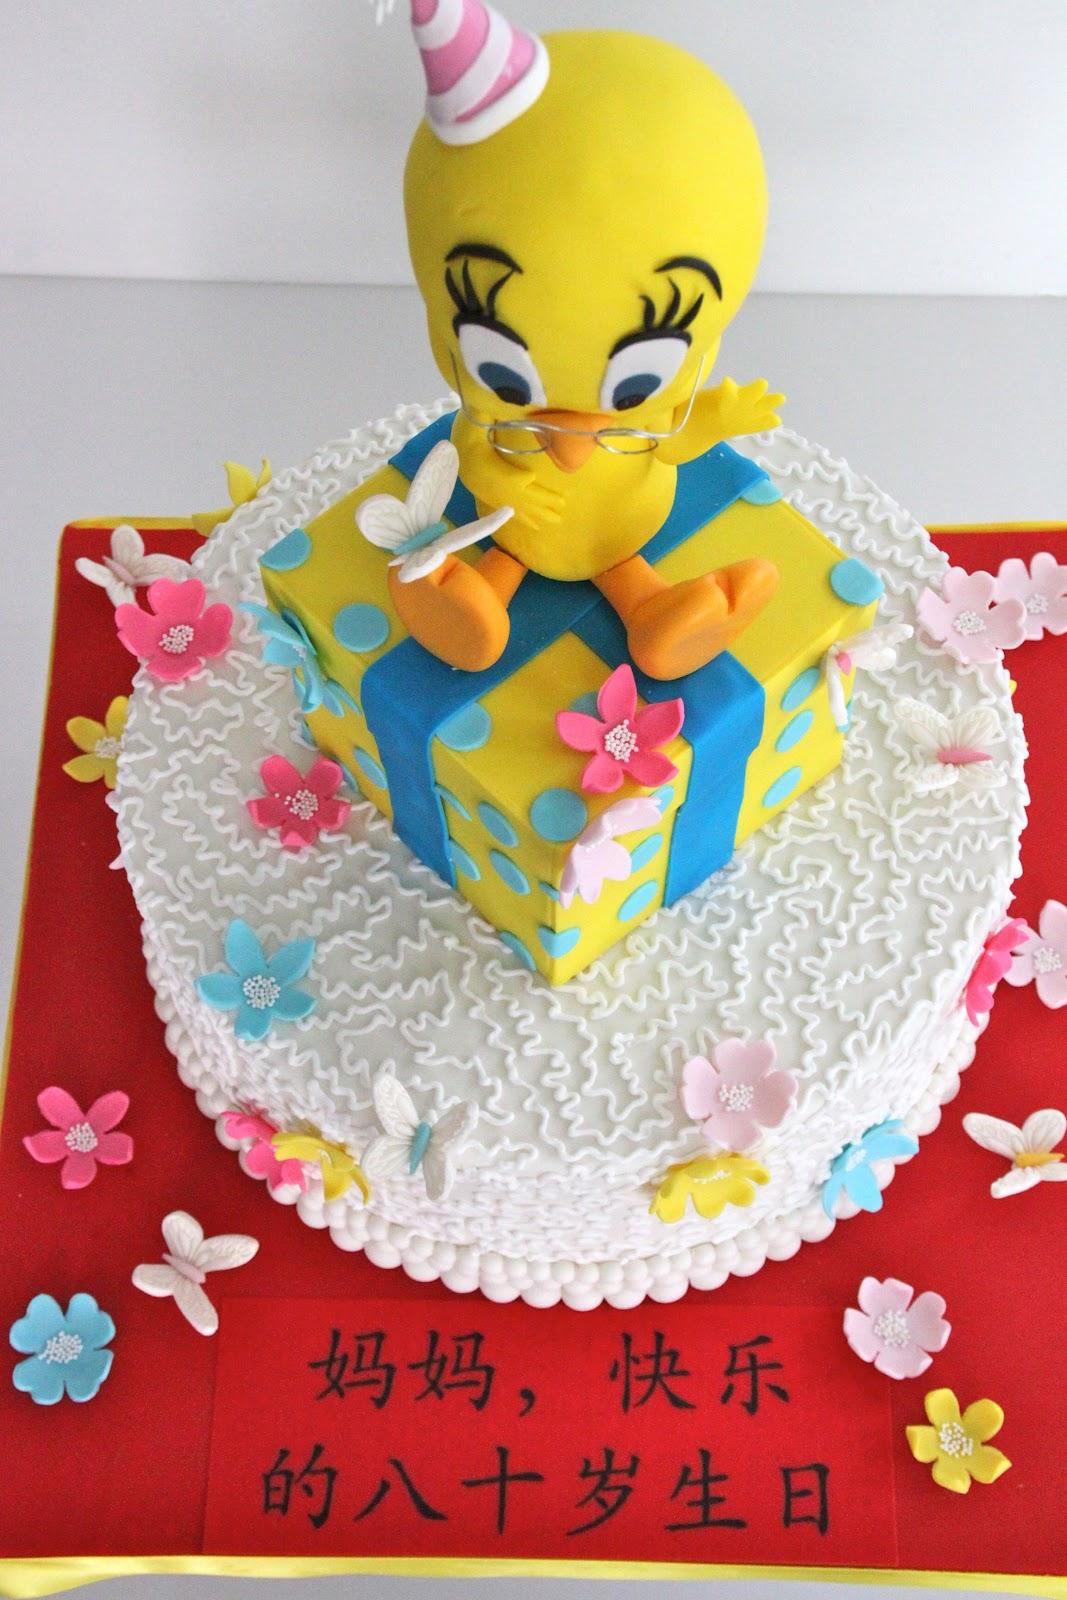 Tweety Bird Birthday Cake Decorations